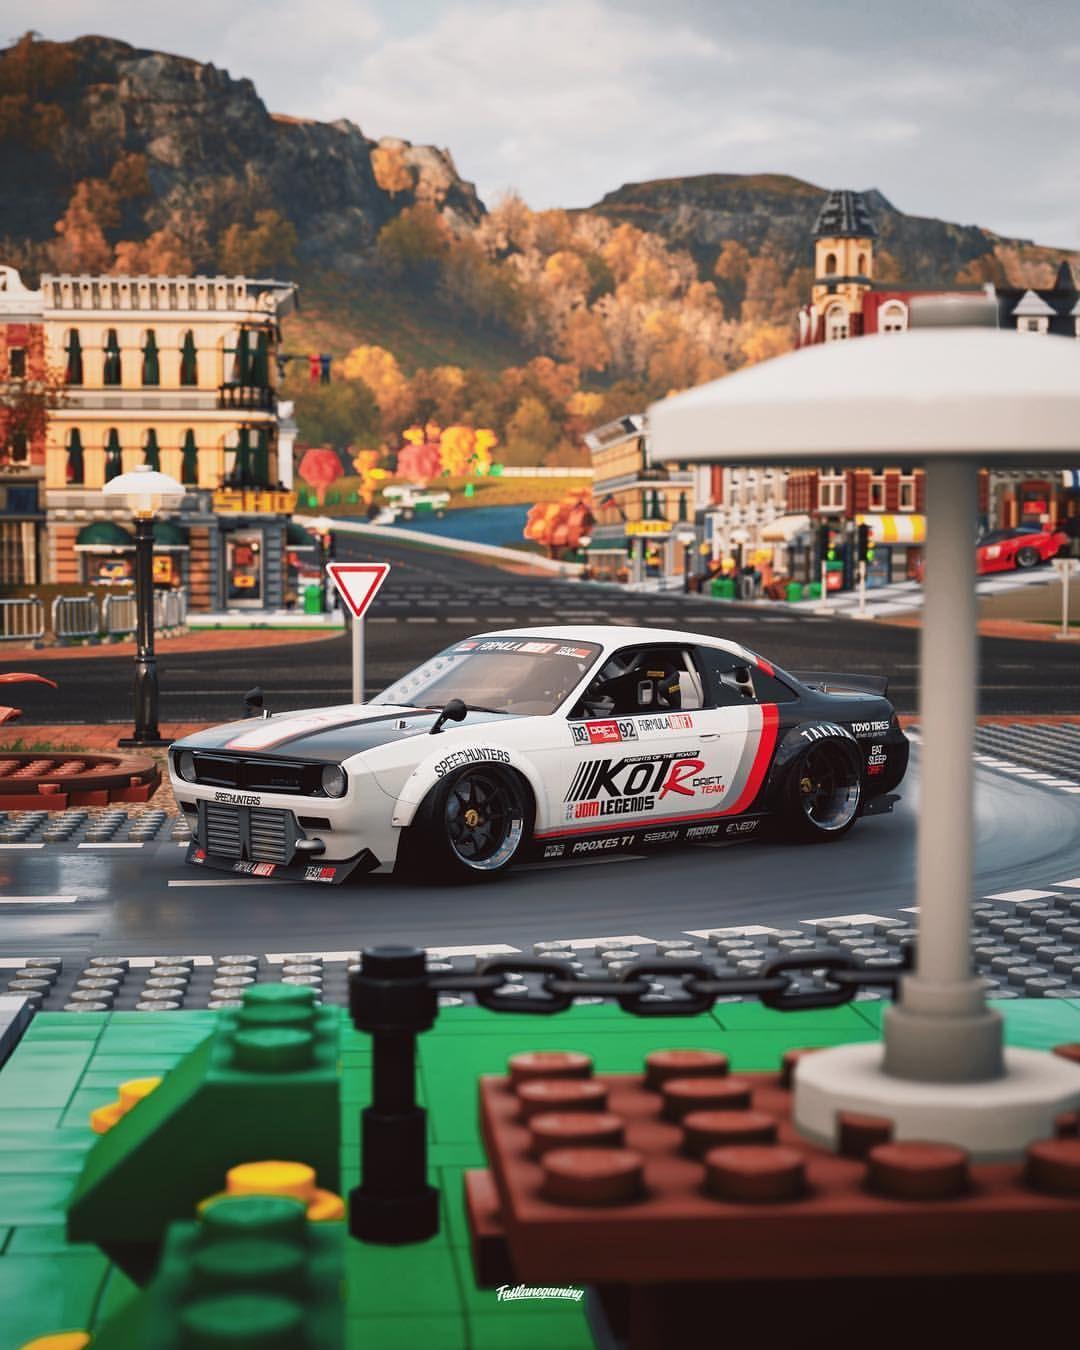 Car Formula Drift 232 Nissan 240sx Game Forza Horizon 4